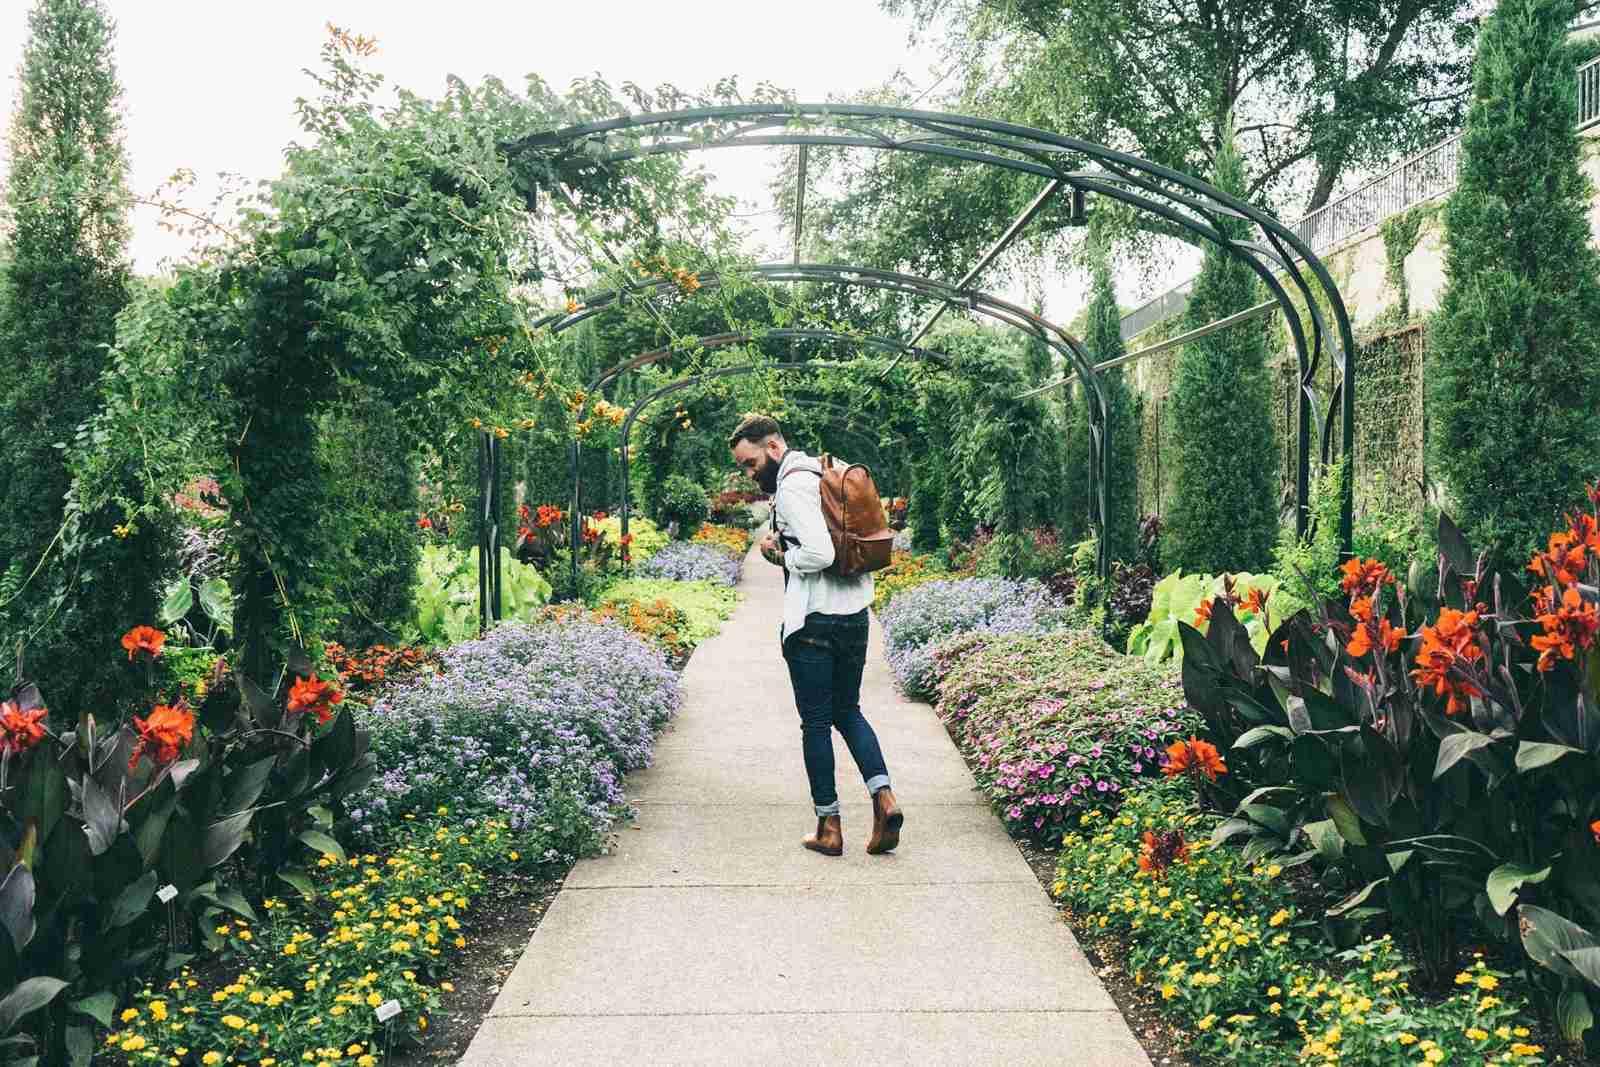 Cheekwood Art & Gardens in Nashville, TN. (Photo by Joshua Ness/Unsplash)